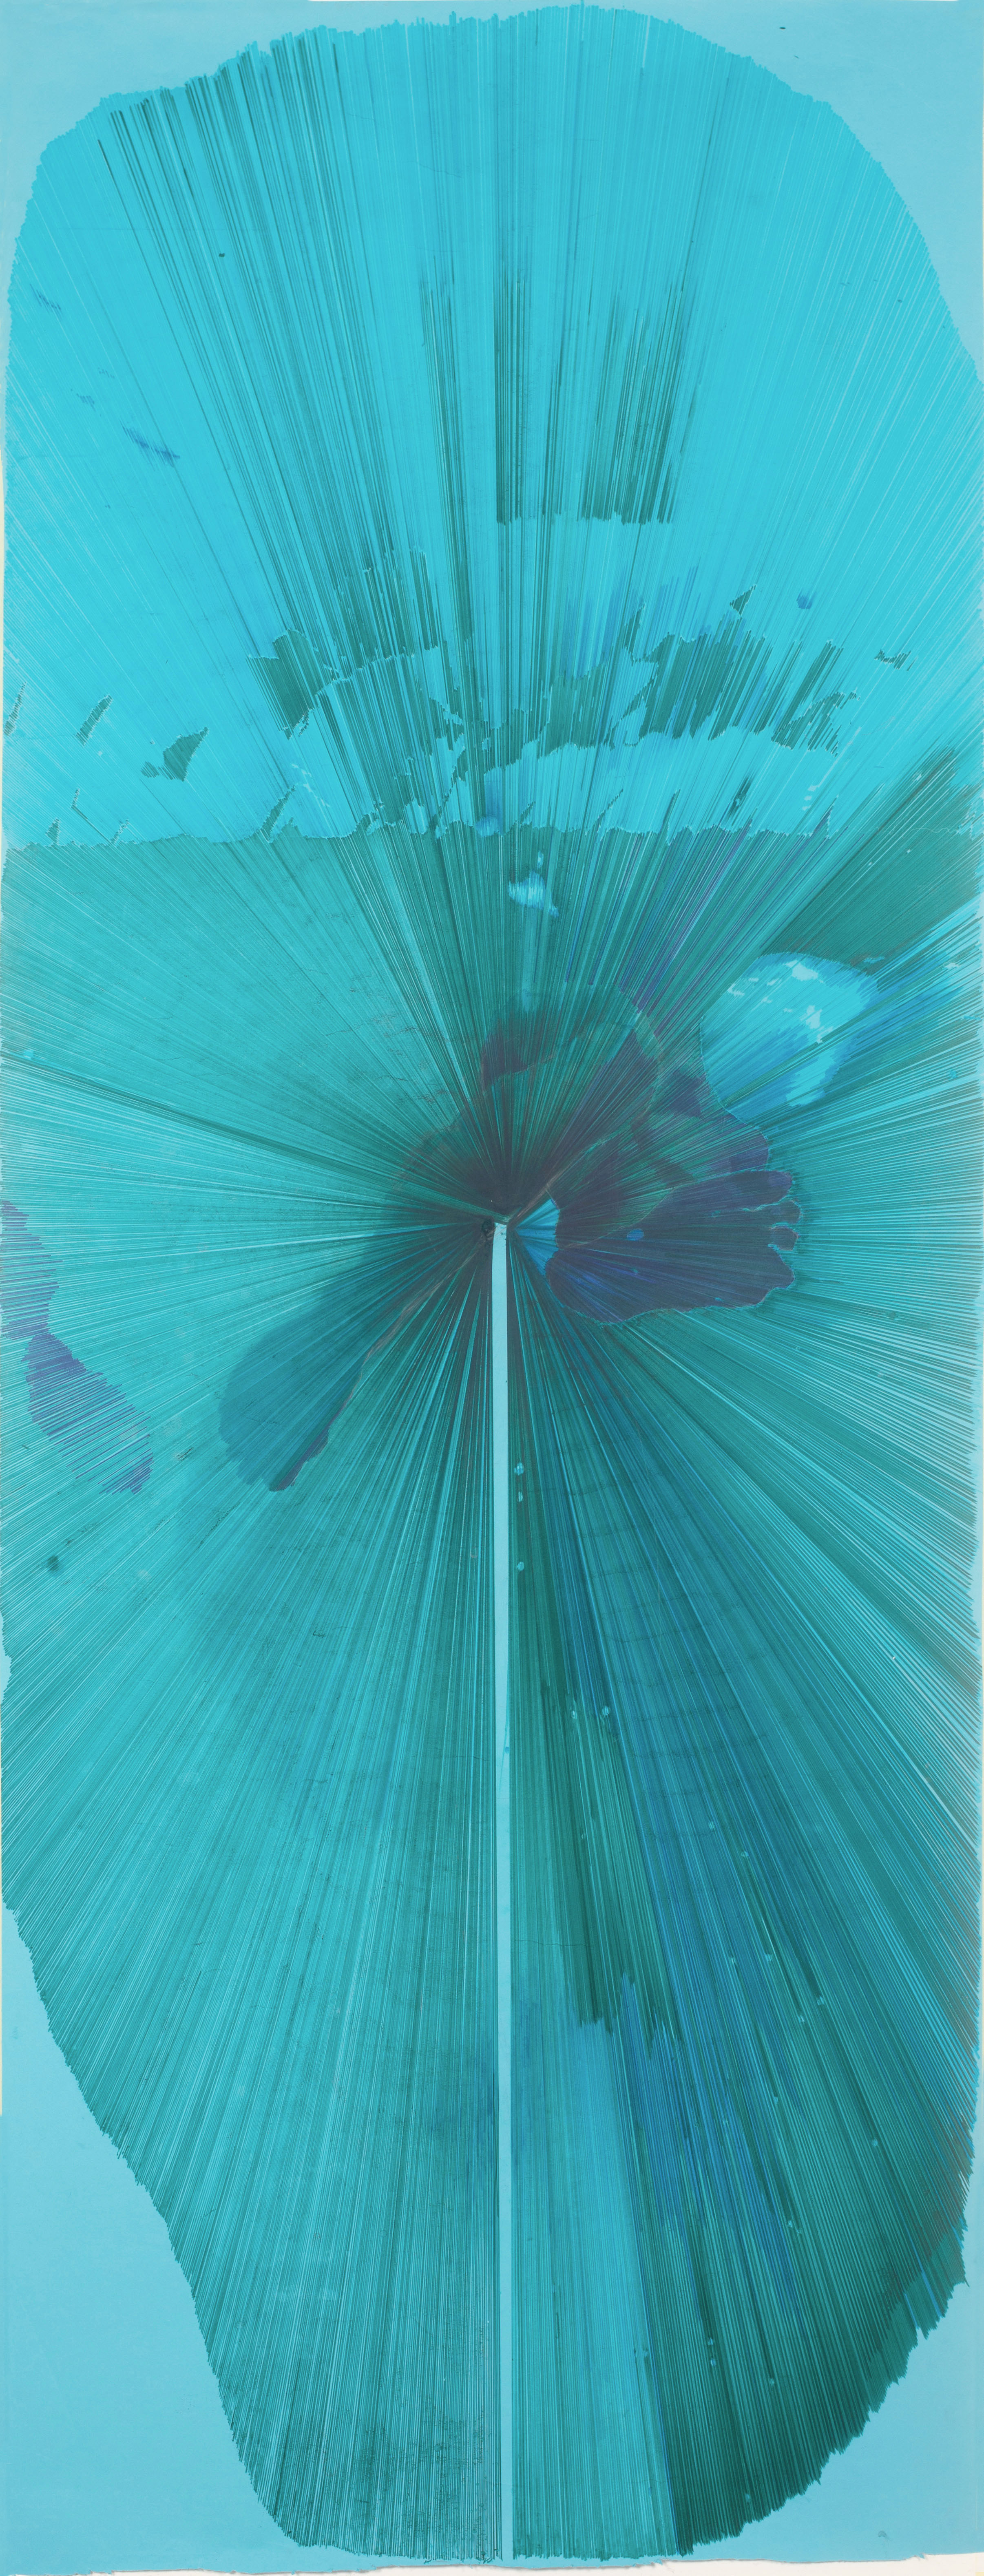 Lam Ly, The Diver, Ink on Paper, 207cm x 84cm,  http://www.random-monkey.com